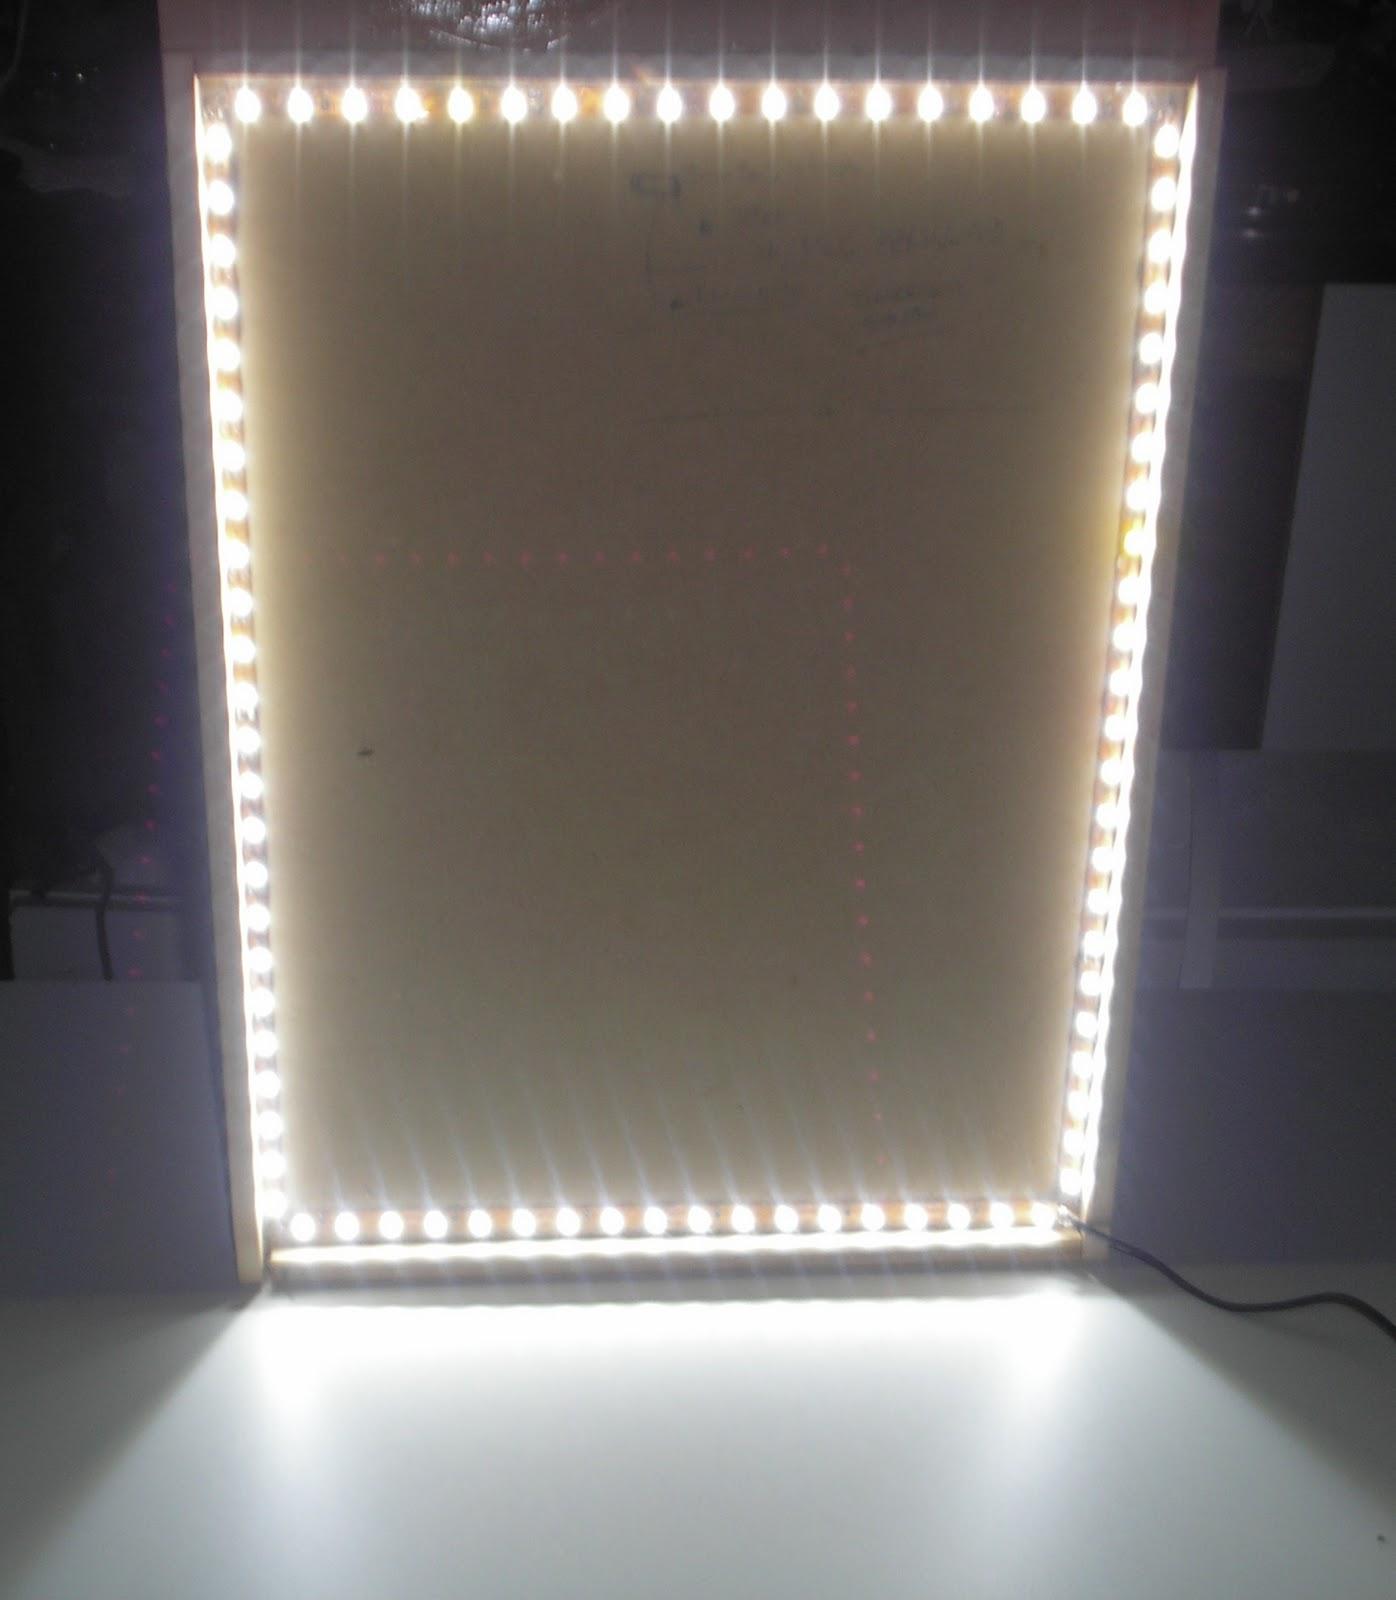 Dekoba os espejos con venecitas y luces de leds - Luces para espejos ...